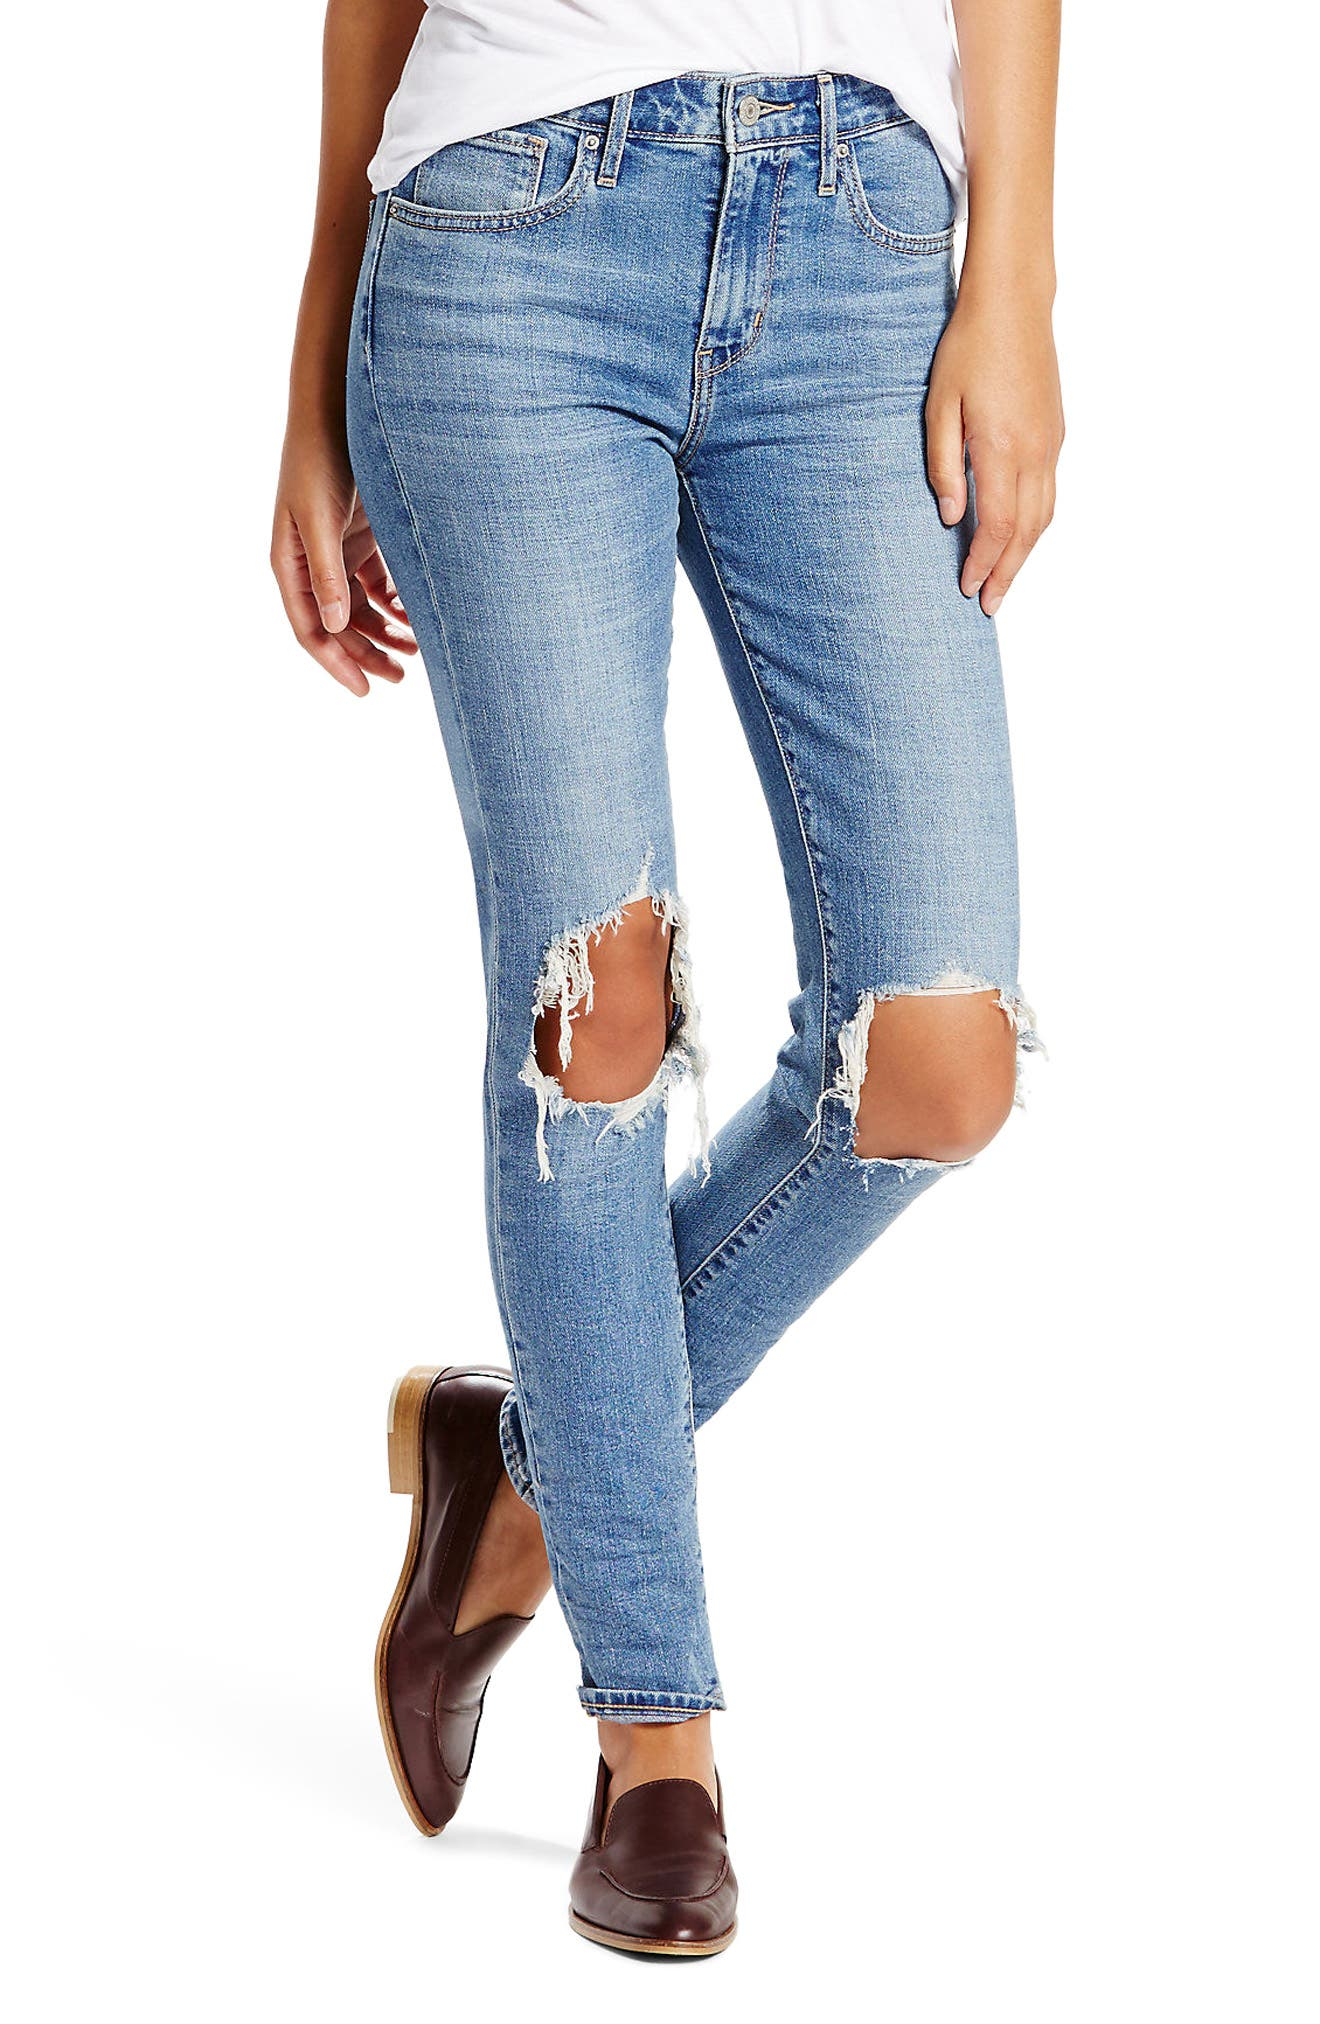 Main Image - Levi's® 721 Ripped High Waist Skinny Jeans (Rugged Indigo)